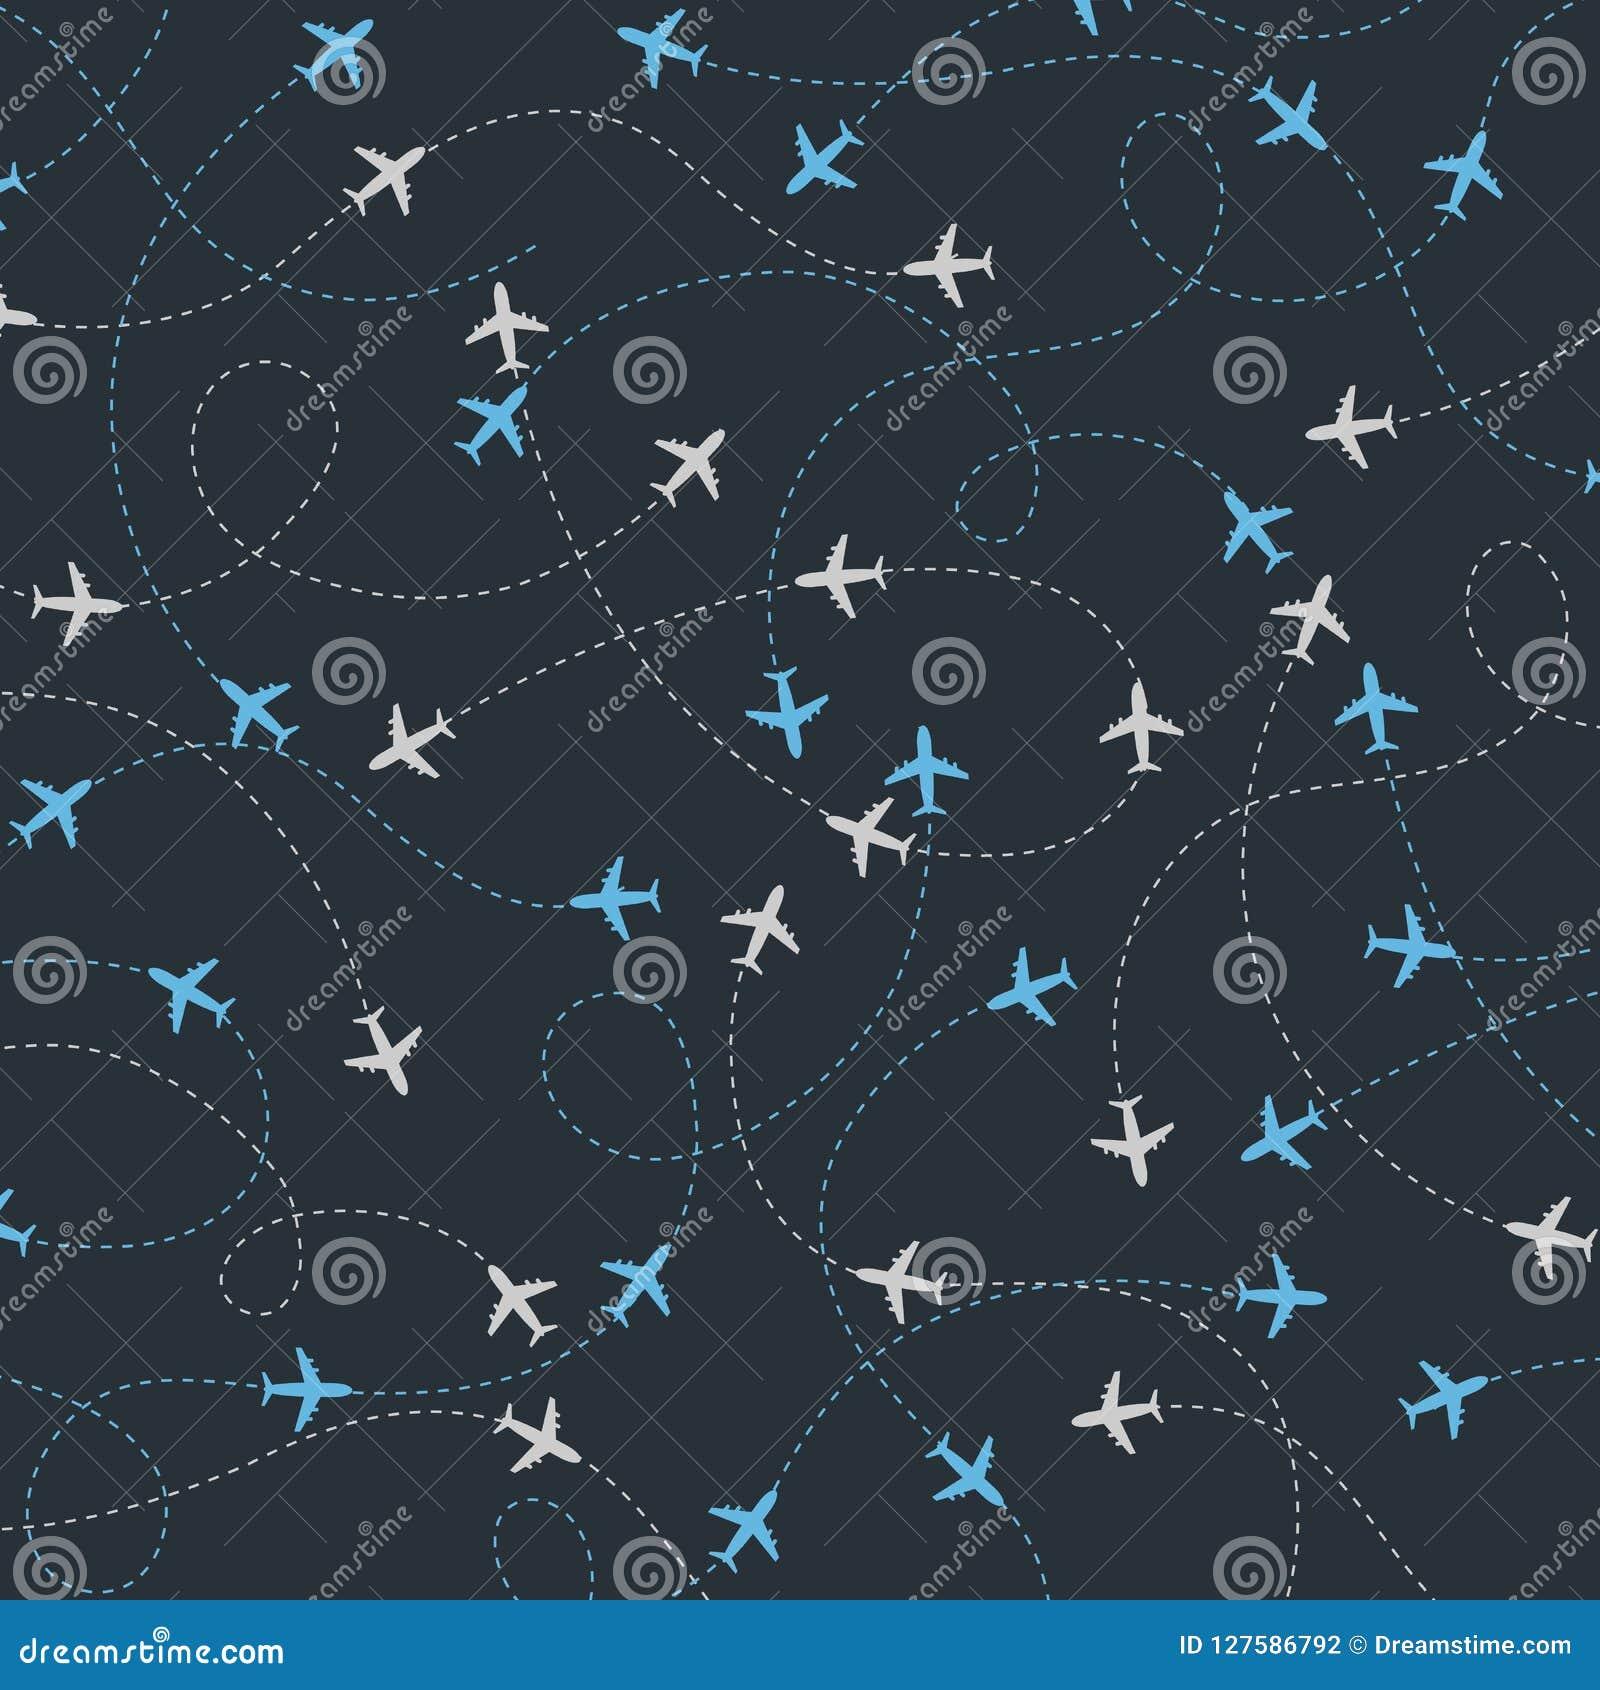 Travel around the world airplane routes seamless pattern